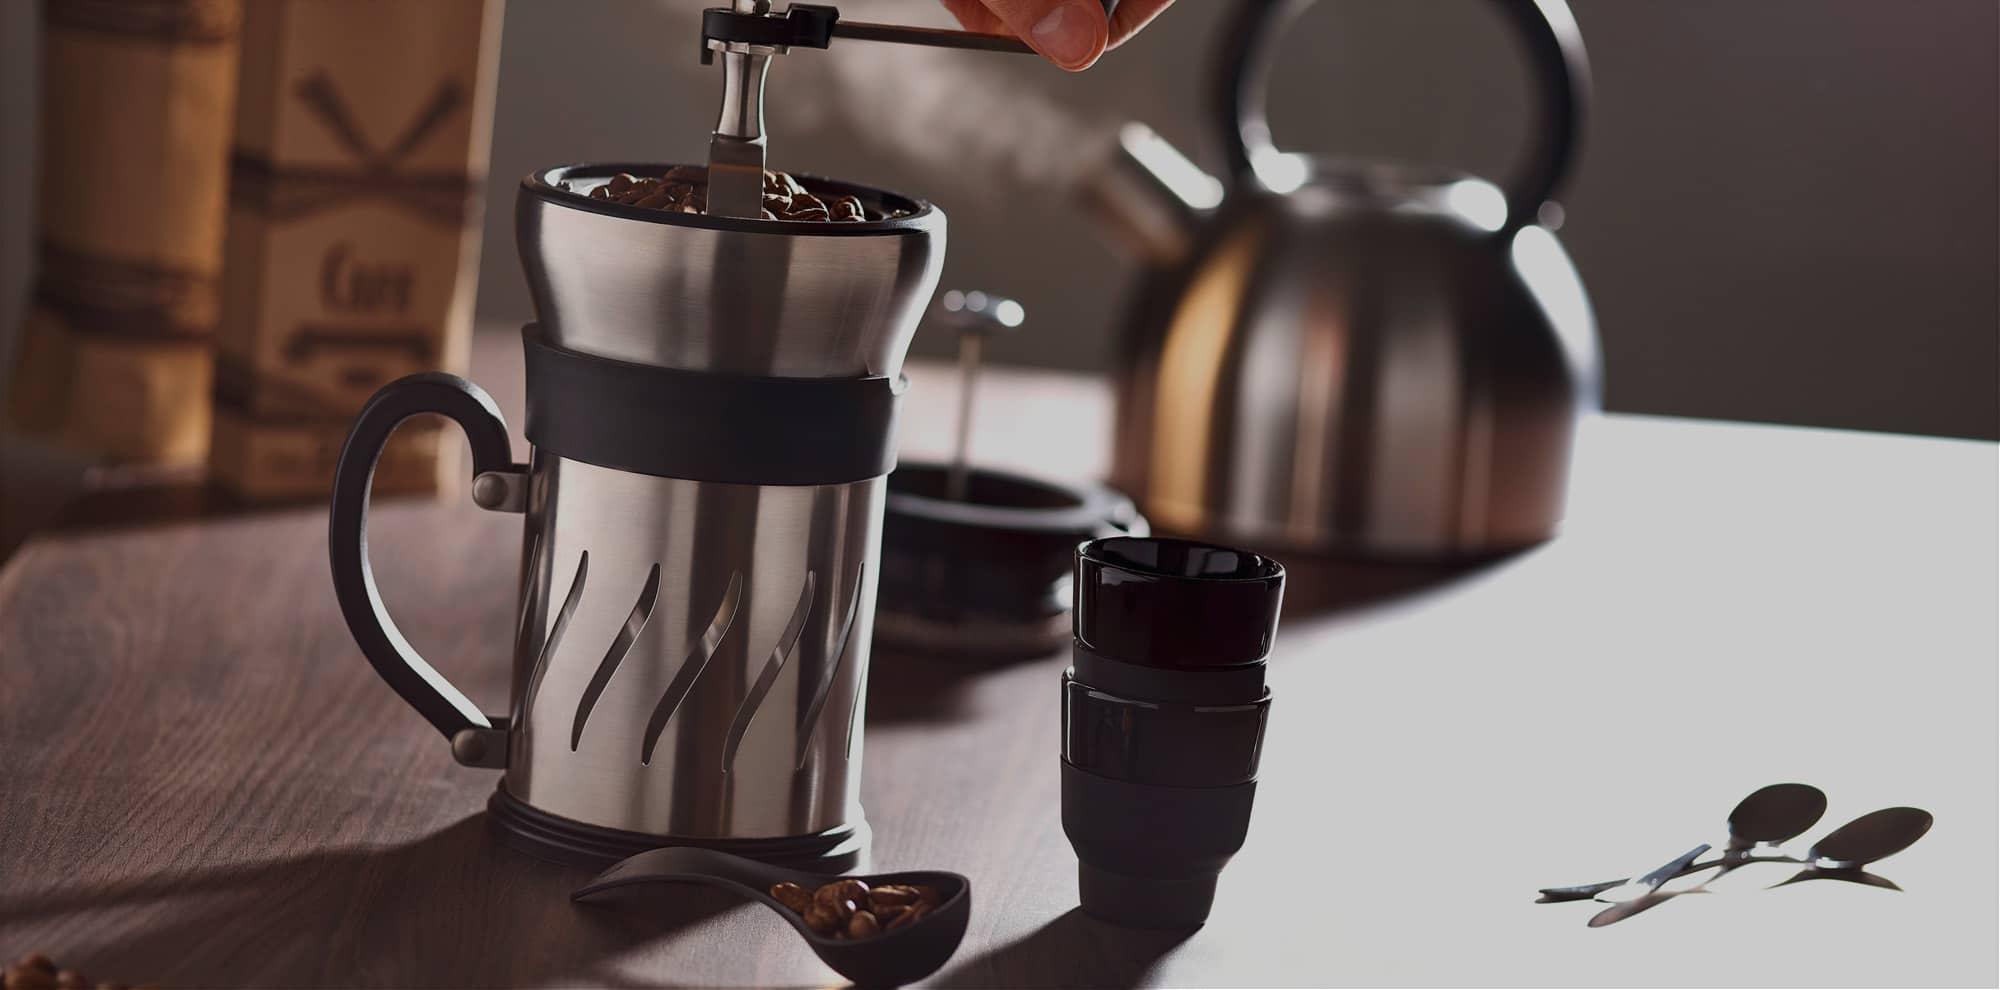 la cafeti re avec moulin int gr peugeot saveurs. Black Bedroom Furniture Sets. Home Design Ideas